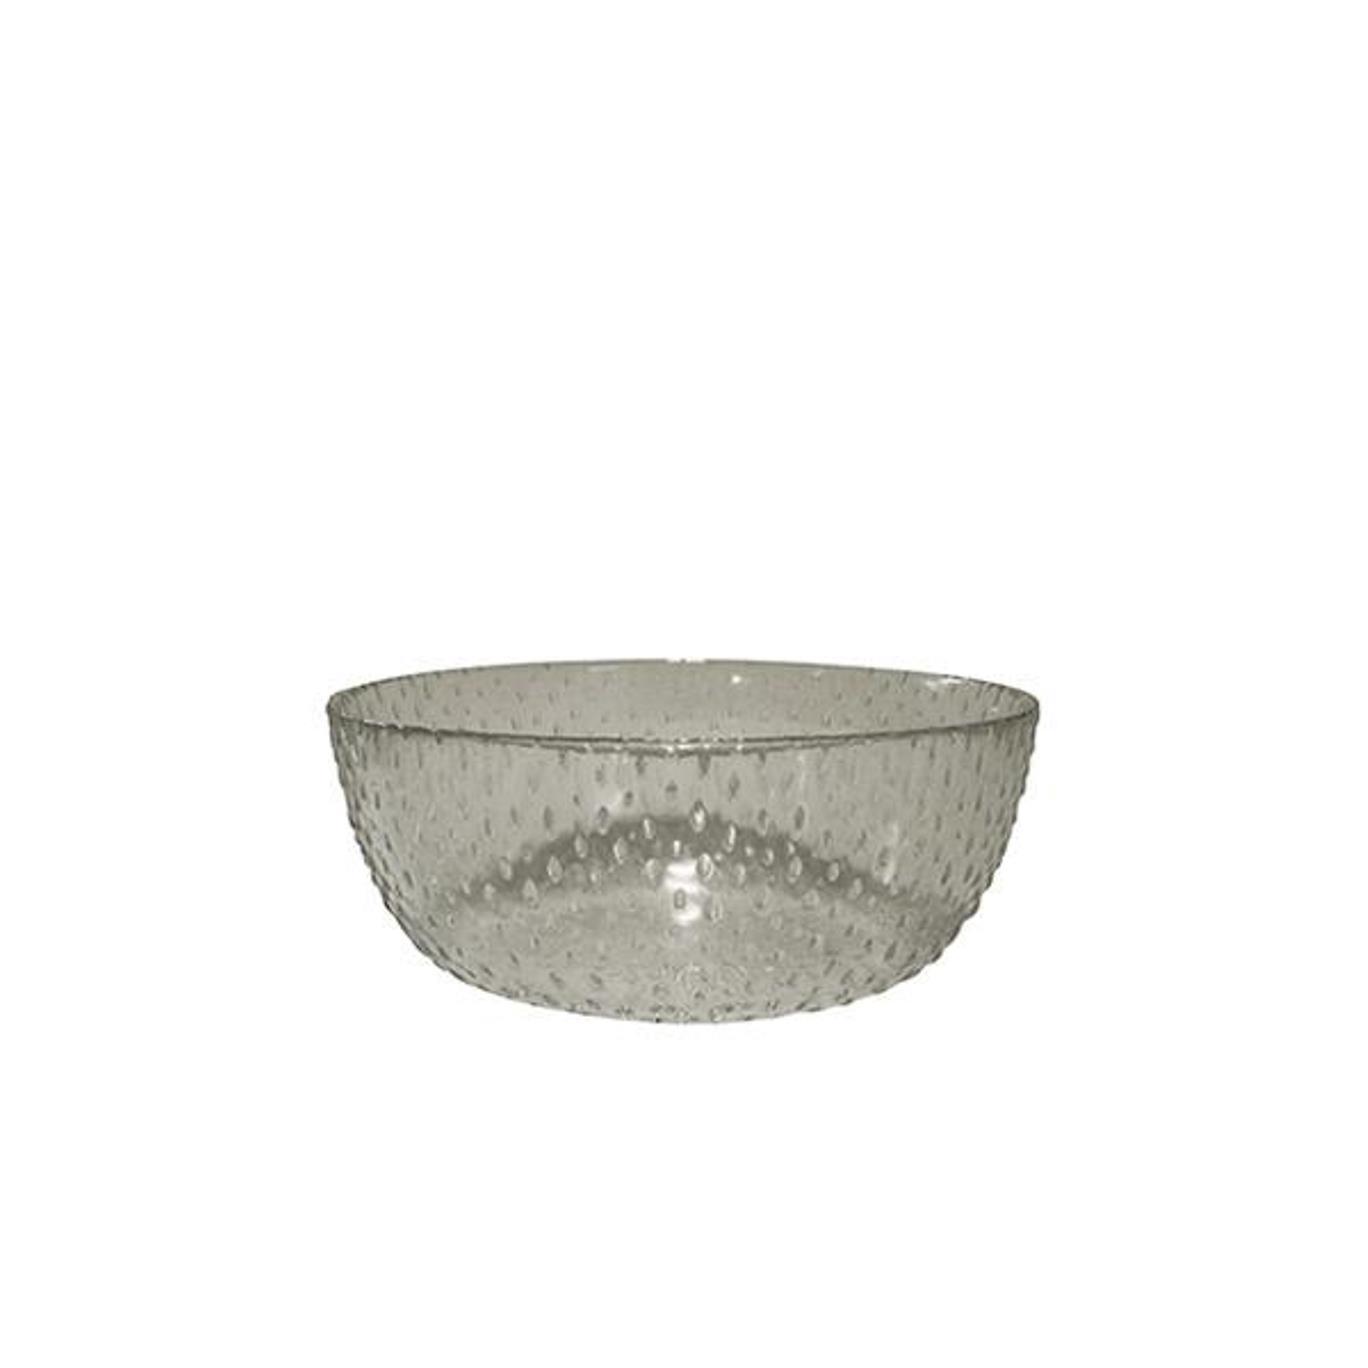 Онлайн каталог PROMENU: Пиала Aida RAW, диаметр 20,5 см, высота 8 см, прозрачный серый                               15065